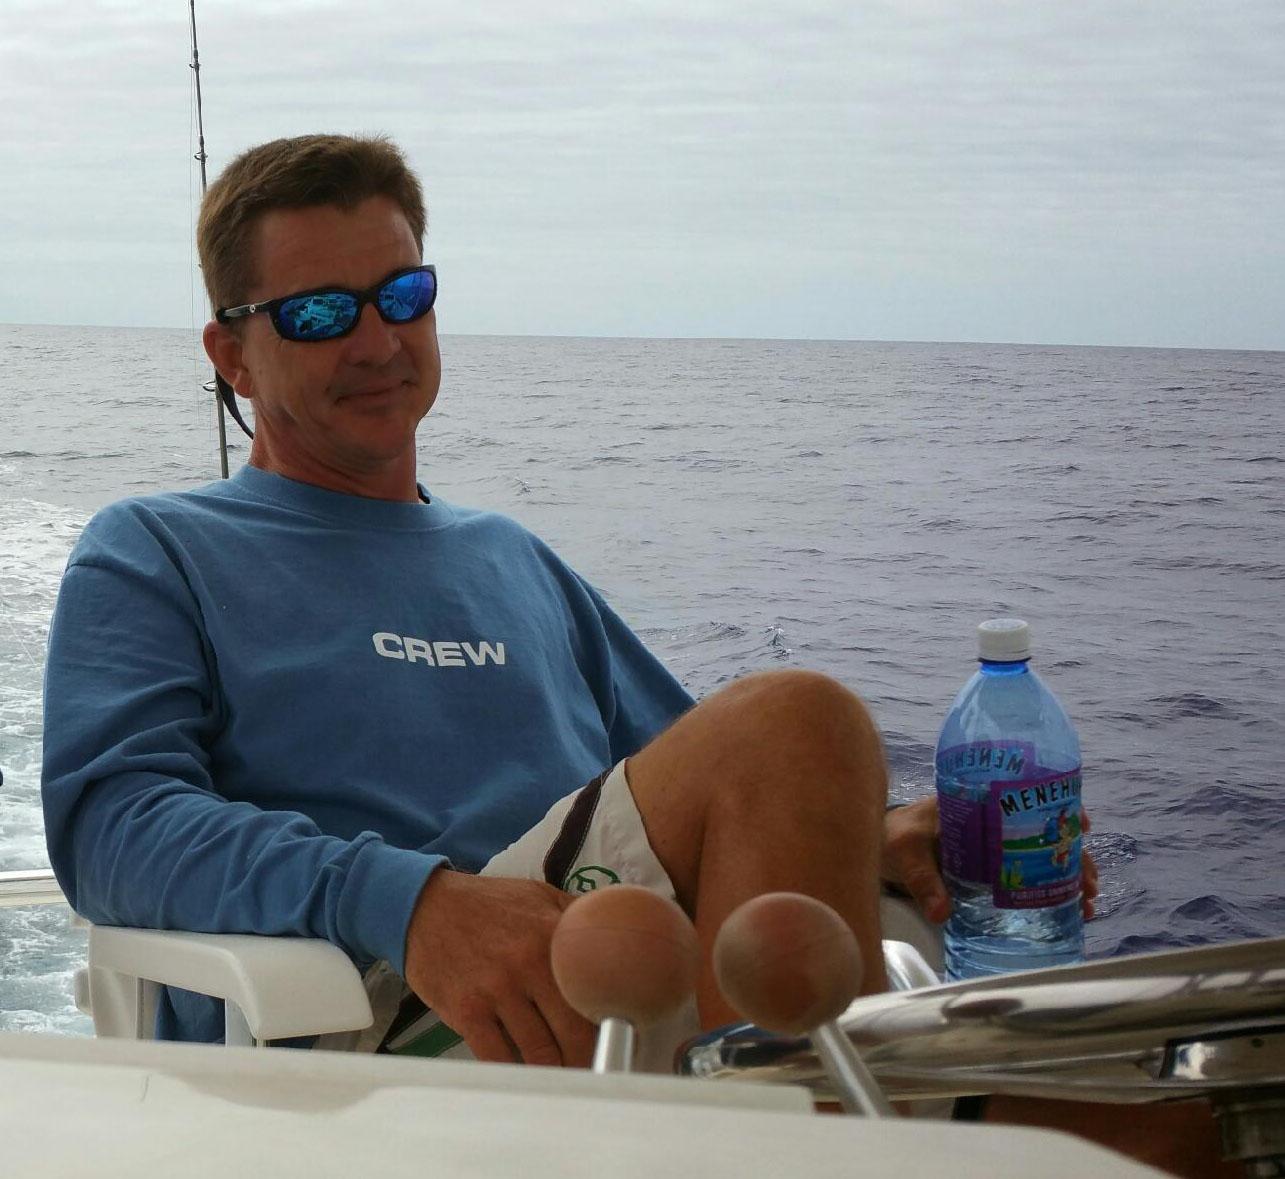 Captain Mike Strait, Wild Bunch Sportfishing, Oahu, Hawaii